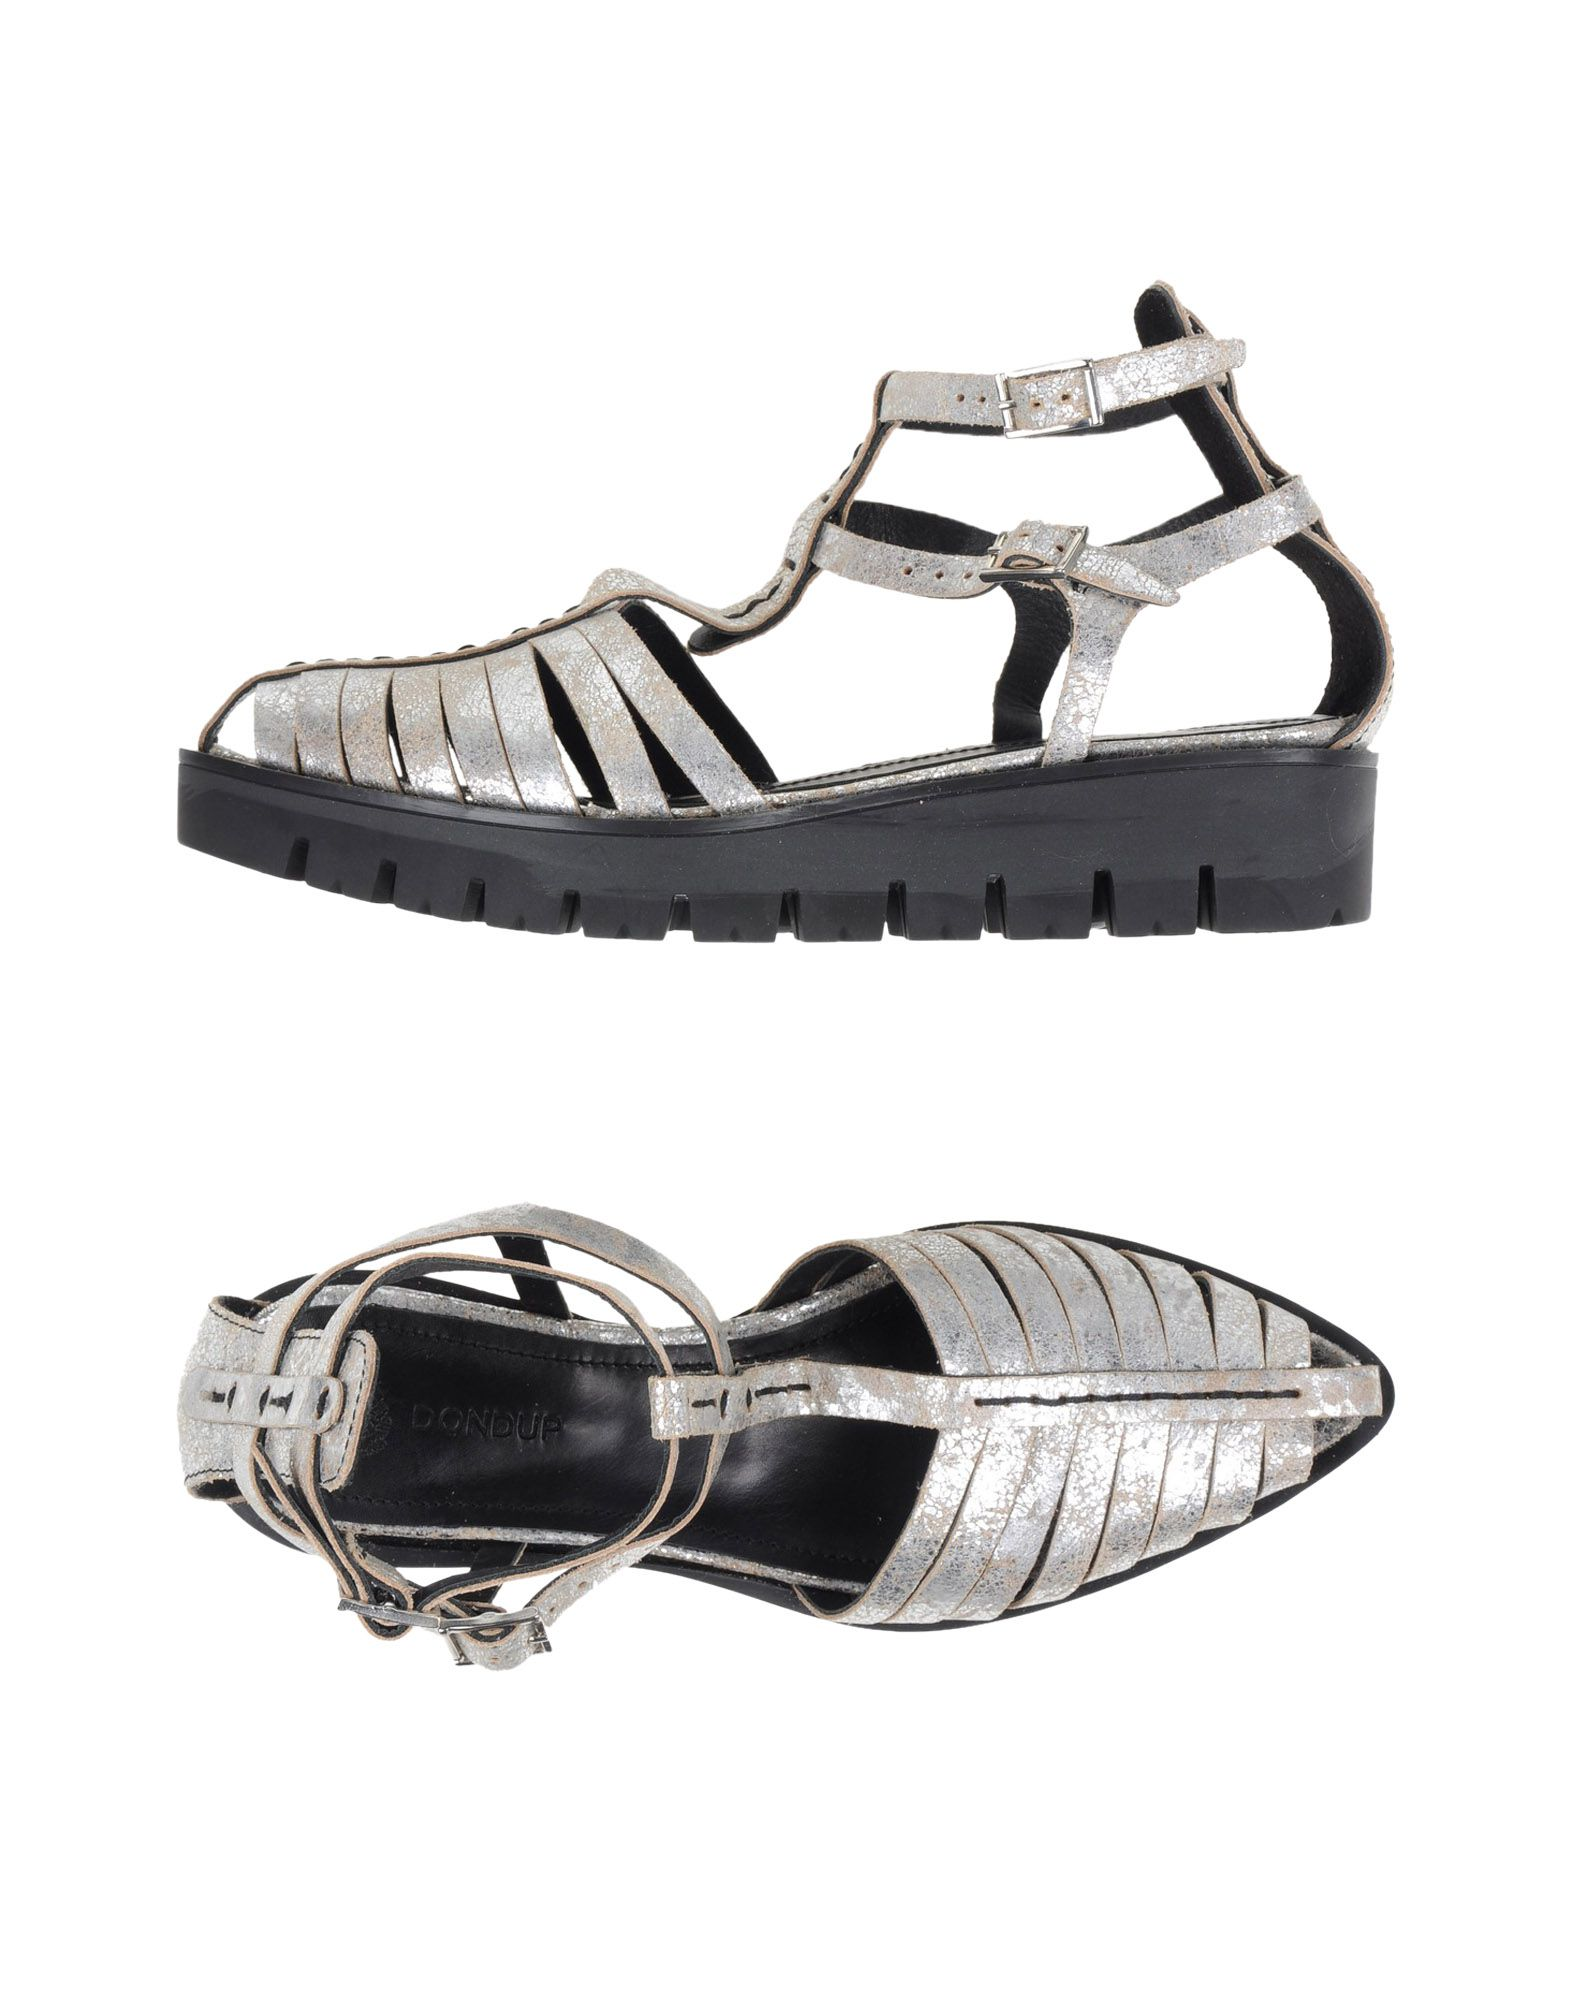 Dondup Dondup Dondup Sandals - Women Dondup Sandals online on  United Kingdom - 11025597SF 308249